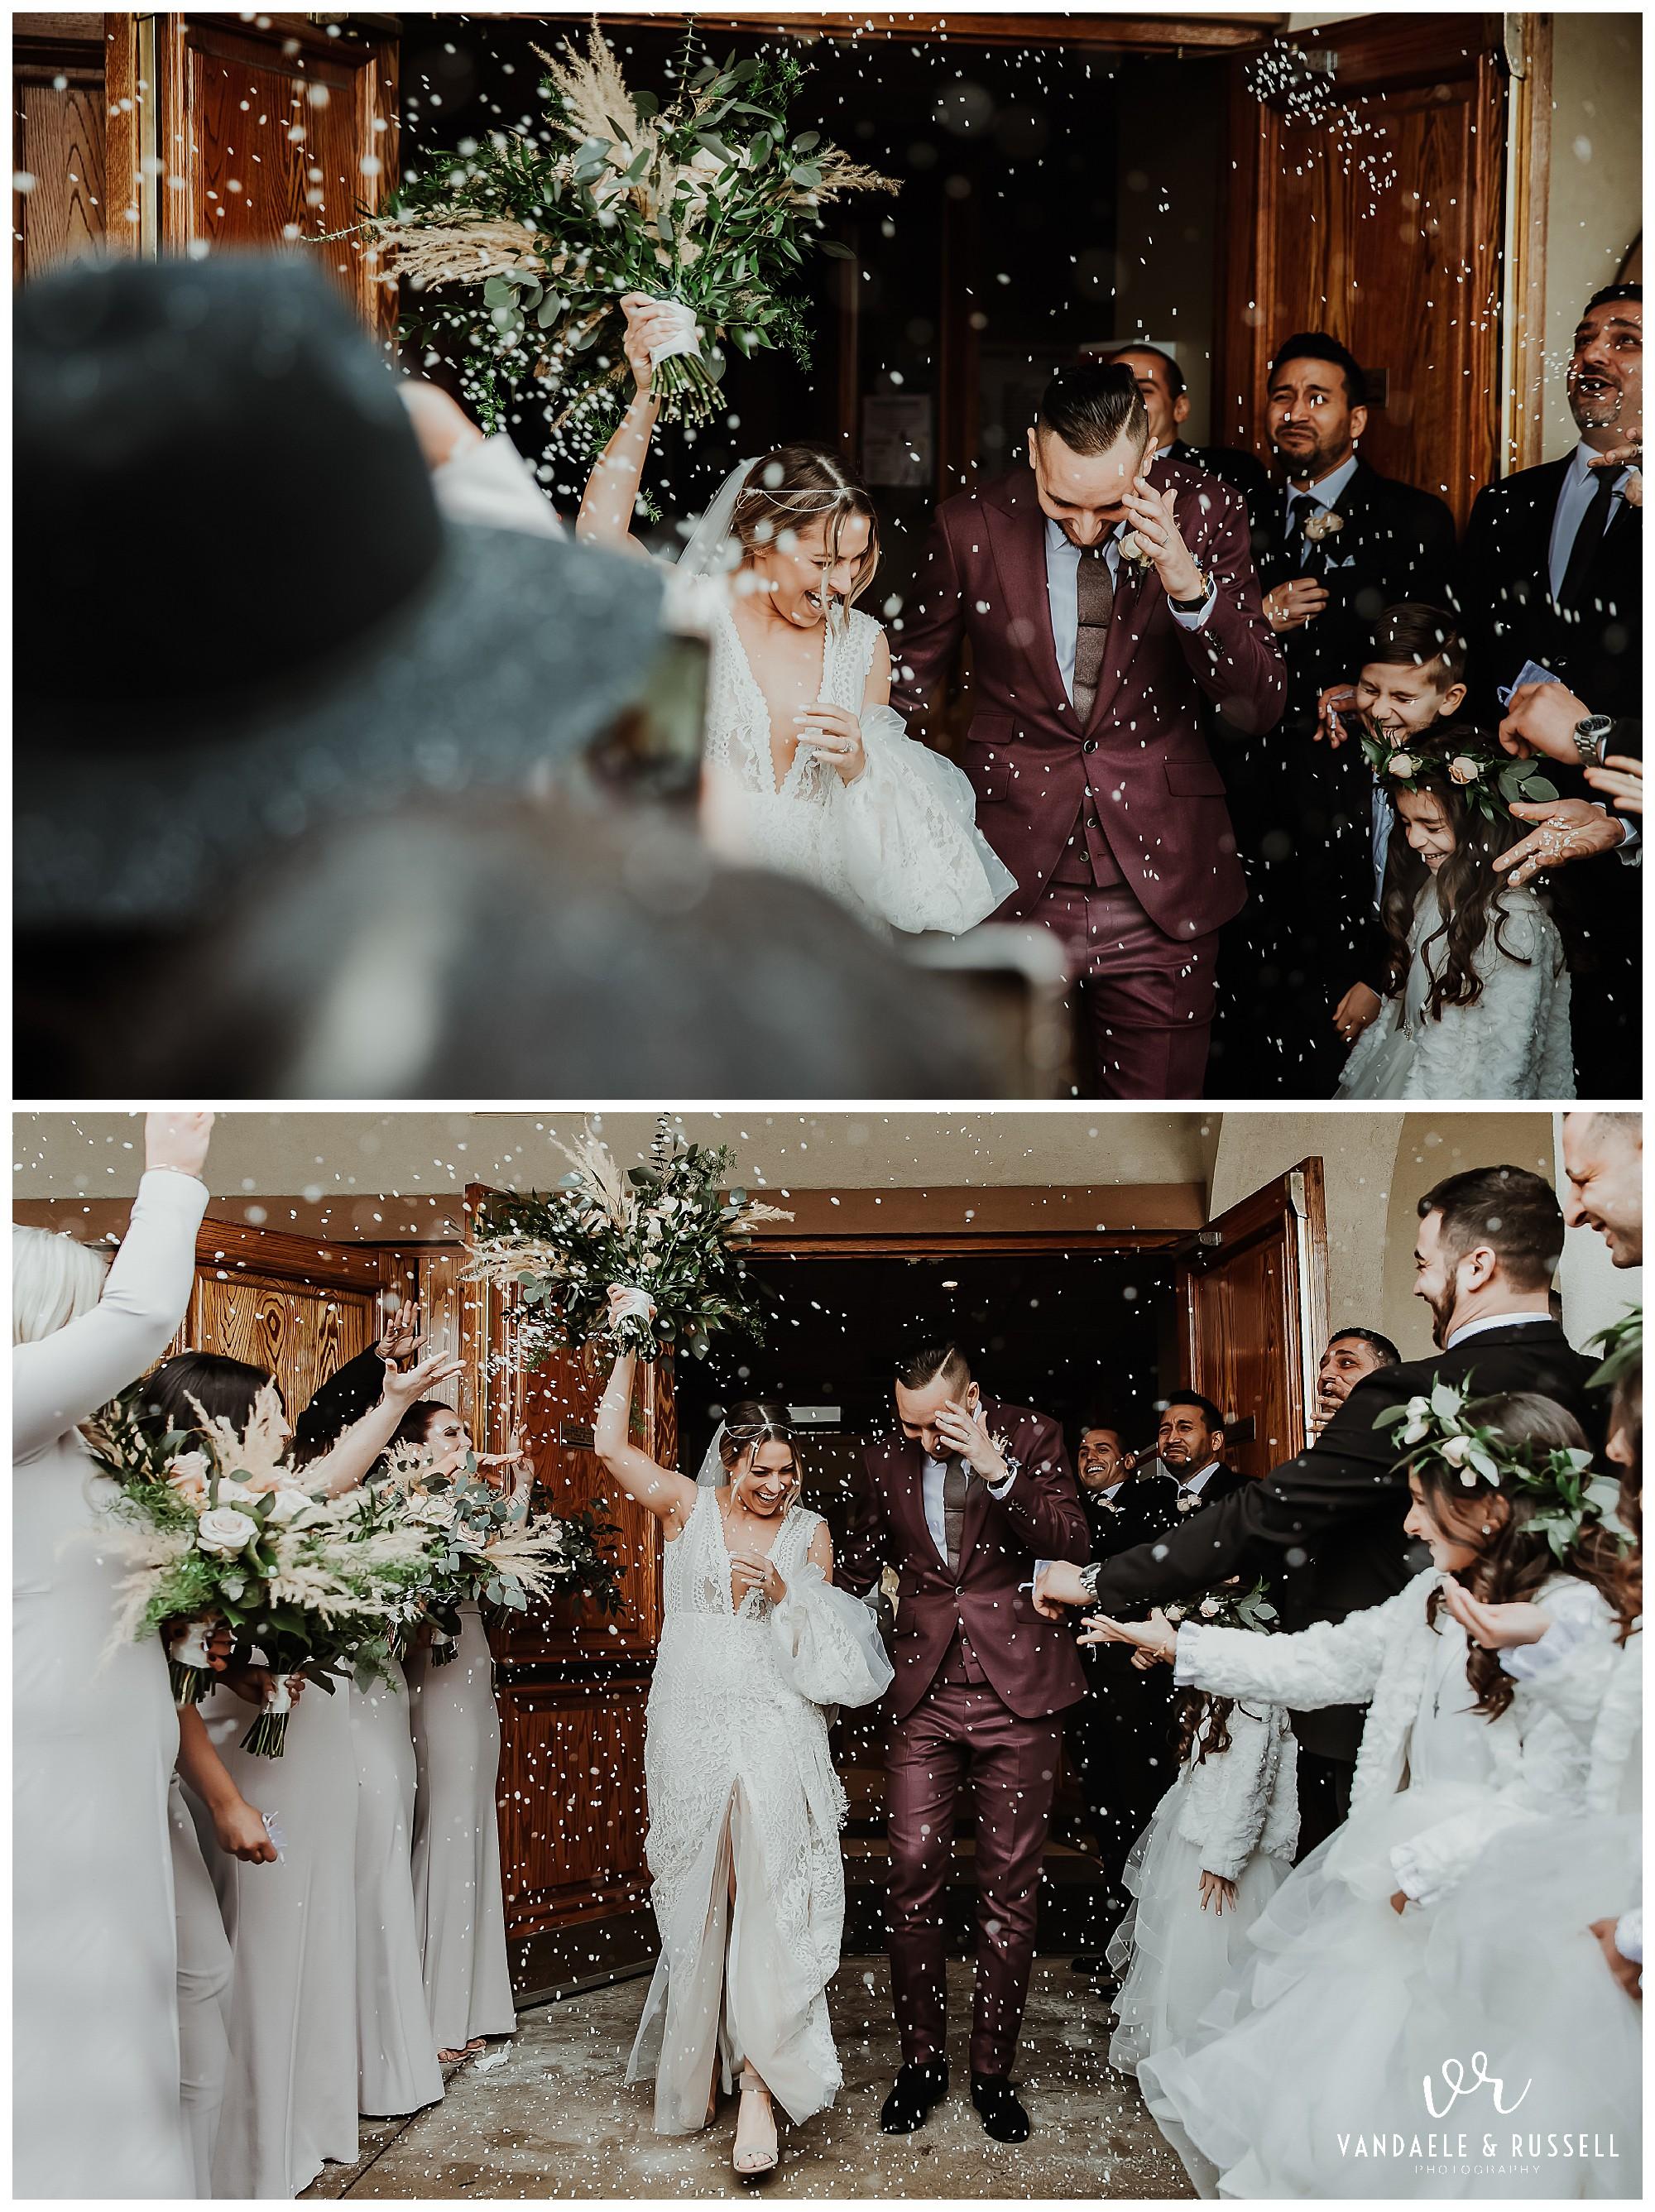 Joanna-Christos-Grand-Luxe-Wedding-Photos-Mint-Room-Toronto-VanDaele-Russell_0077.jpg